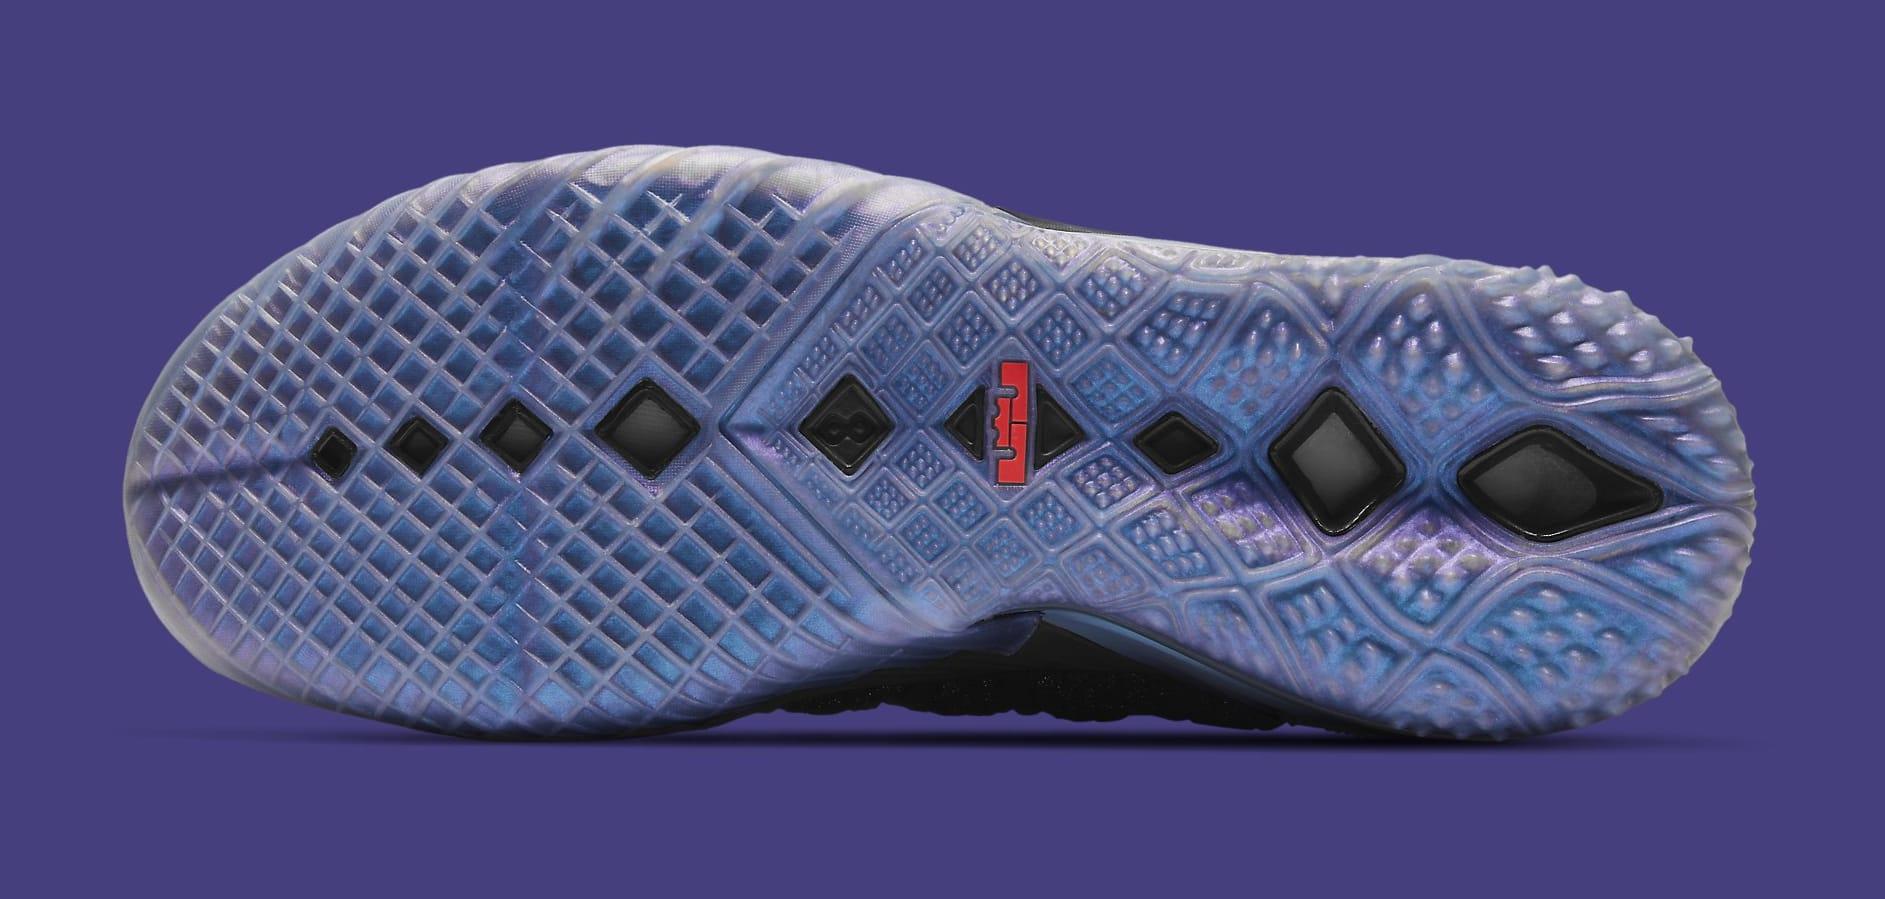 Kylian Mbappe x Nike LeBron 18 GS DB7644-001 Outsole